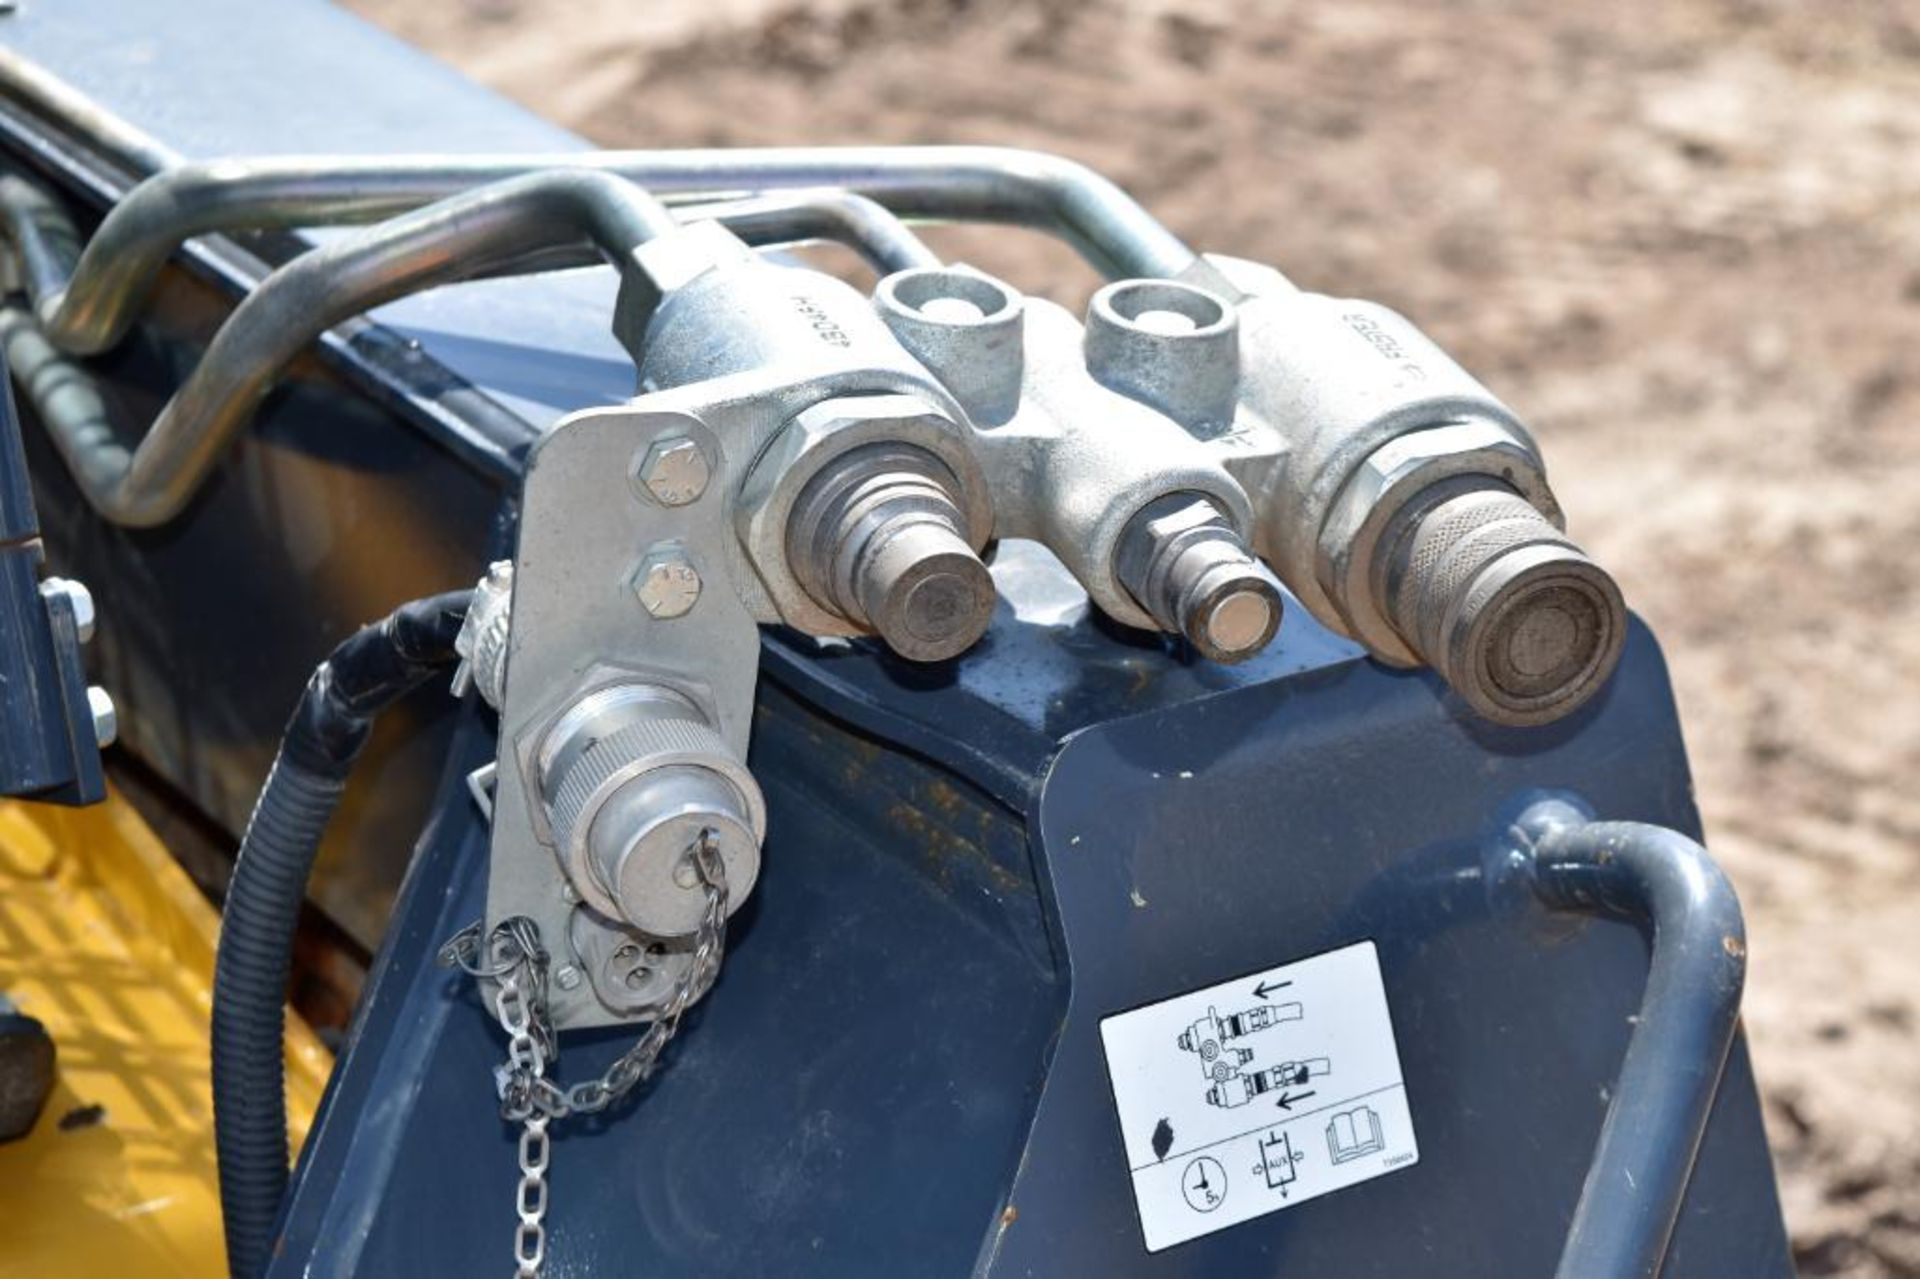 Lot 1 - John Deere Model 328E Skid Steer Loader S/N: 1T0328EKHFE277069 (2015) Bucket, Aux. Hyd., Cab, 14-17.